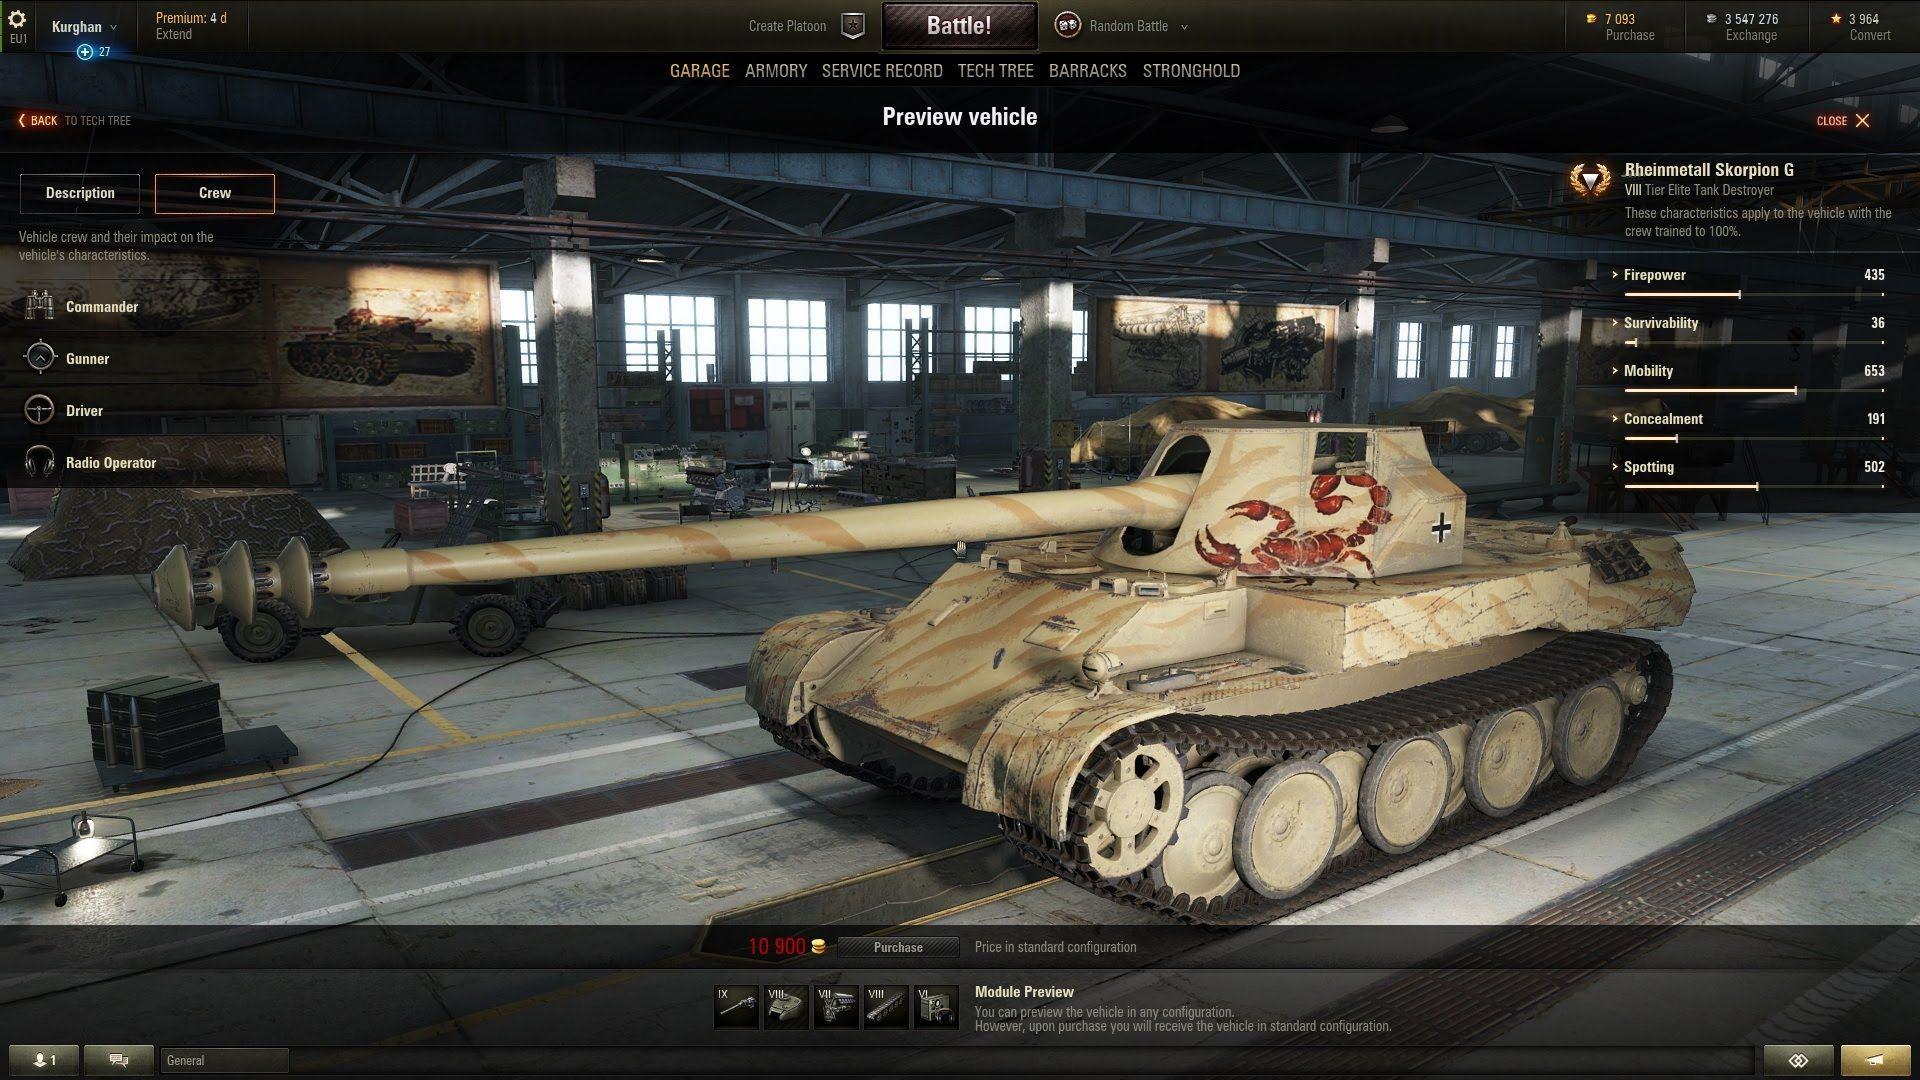 1198f62e97a78676cb43c879c69a59a2 - How To Get Premium Tanks In World Of Tanks